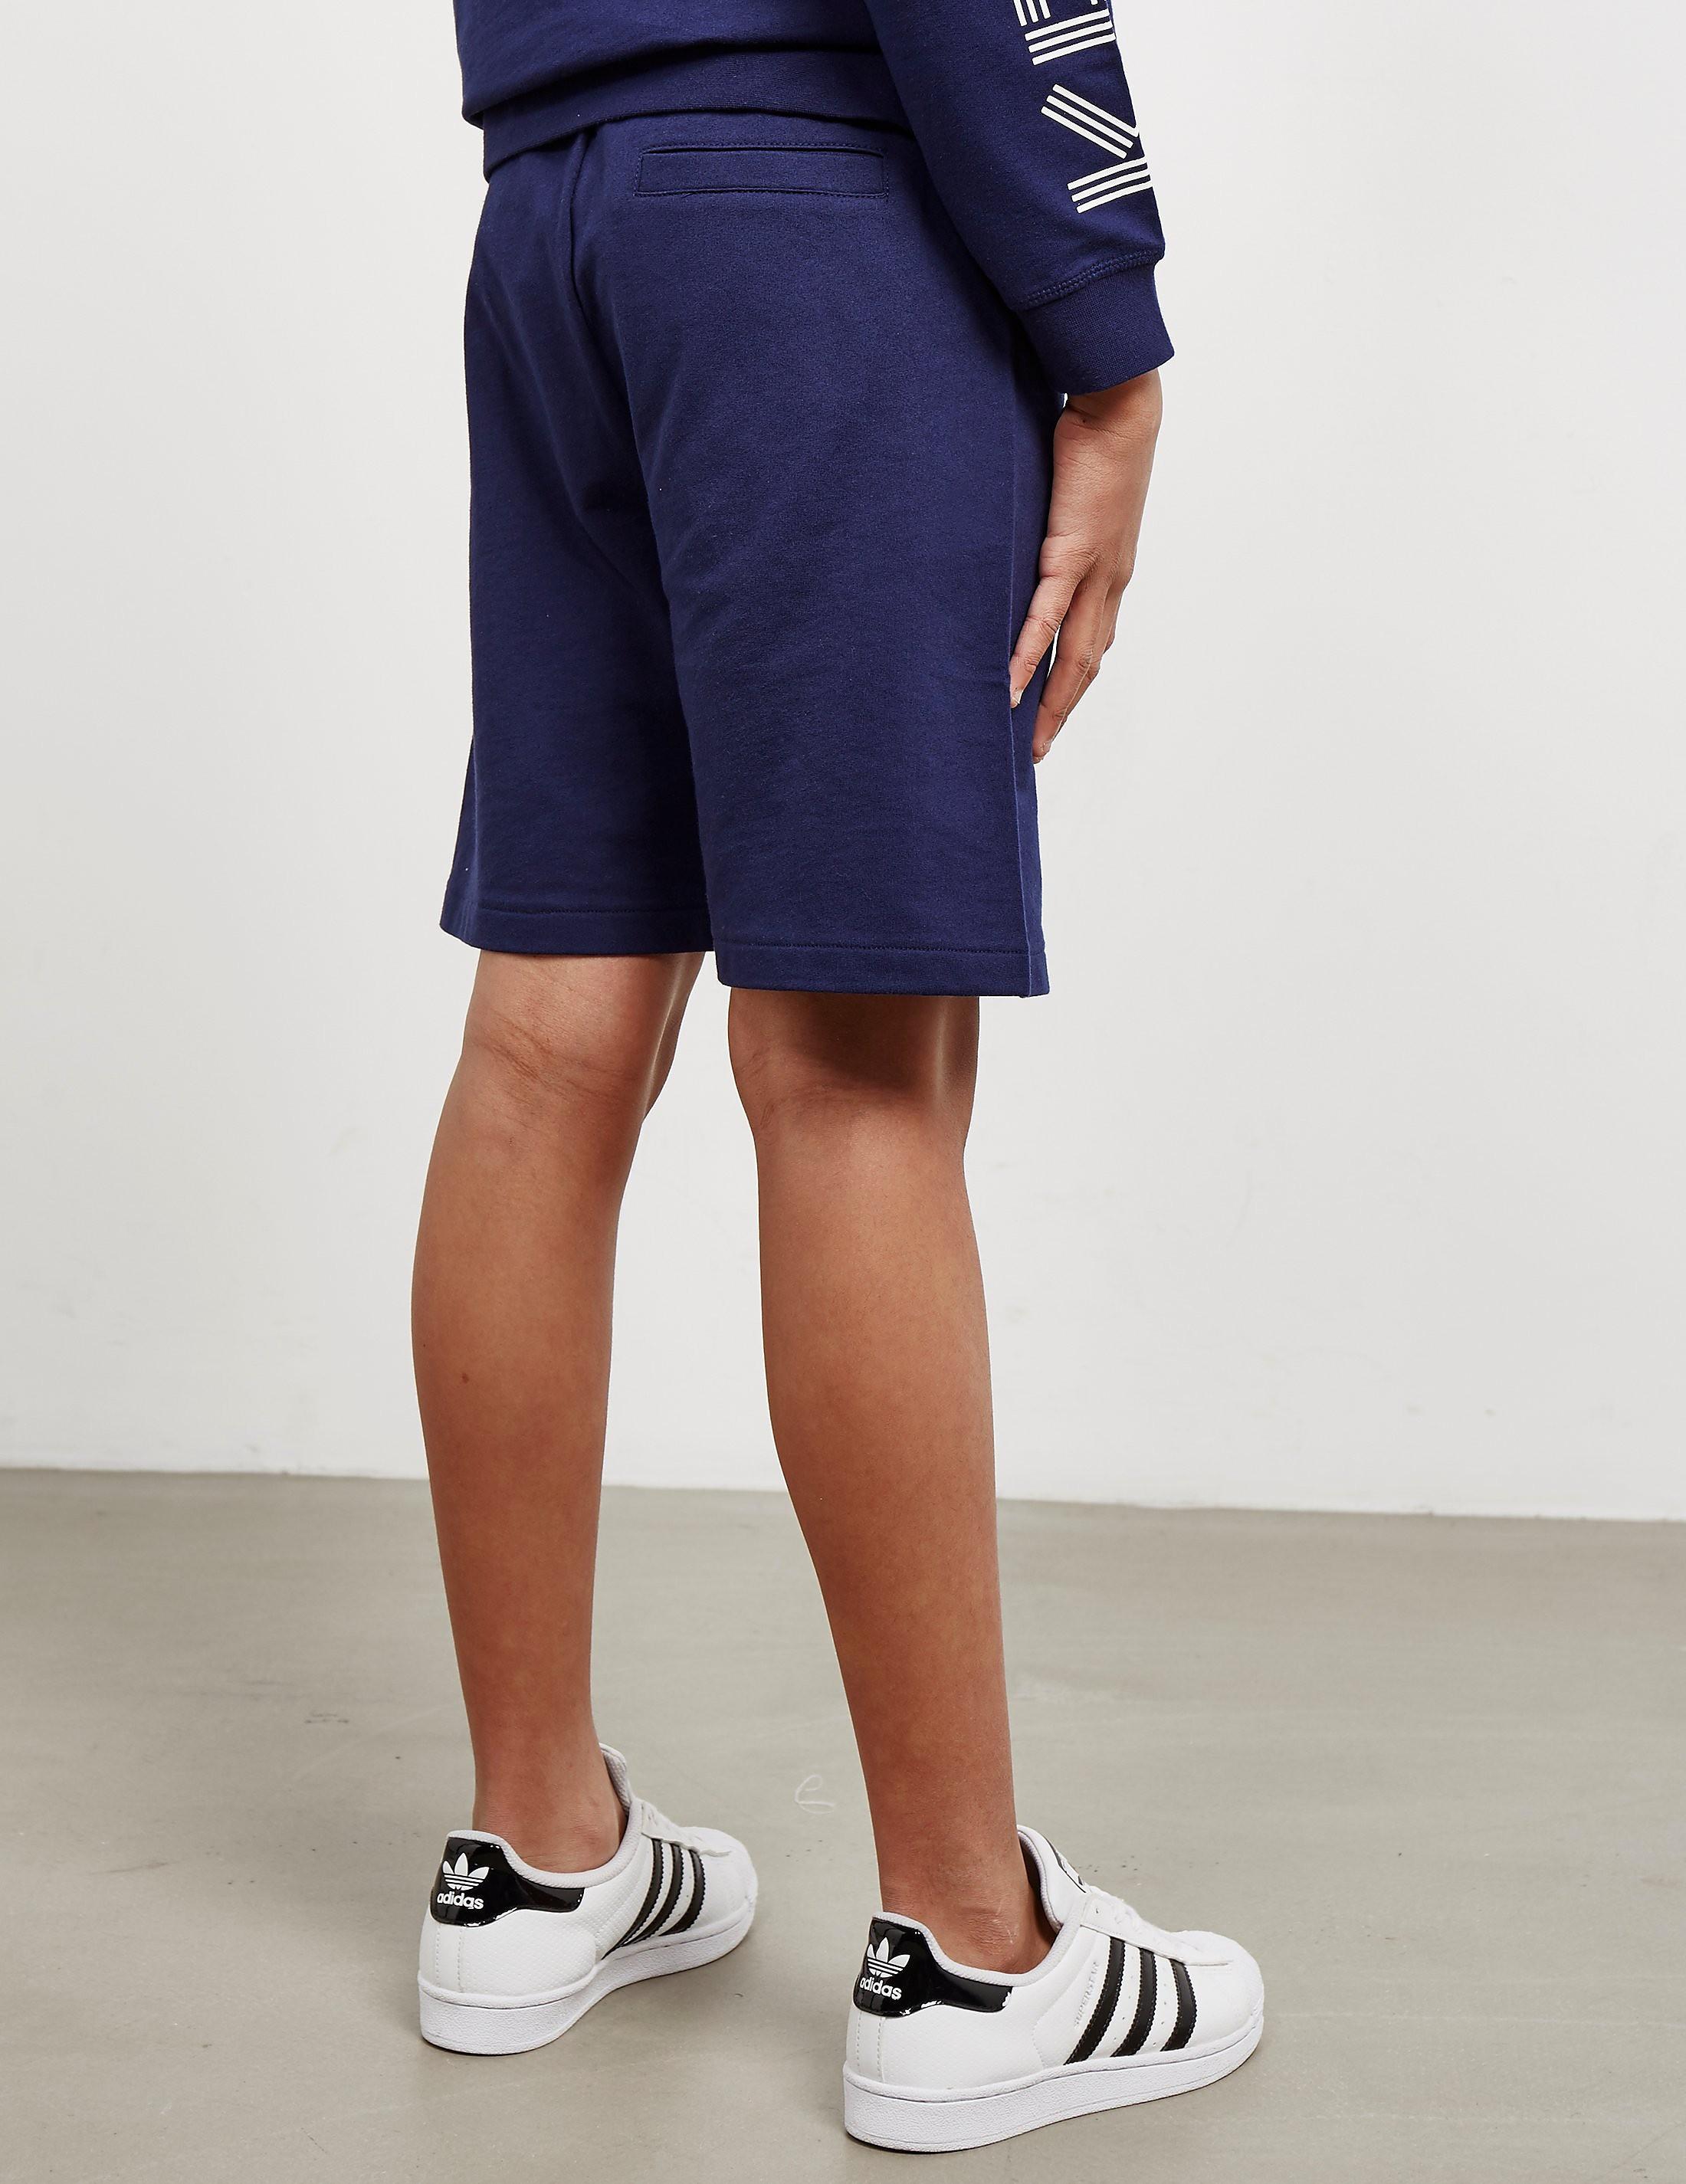 KENZO Letter Shorts